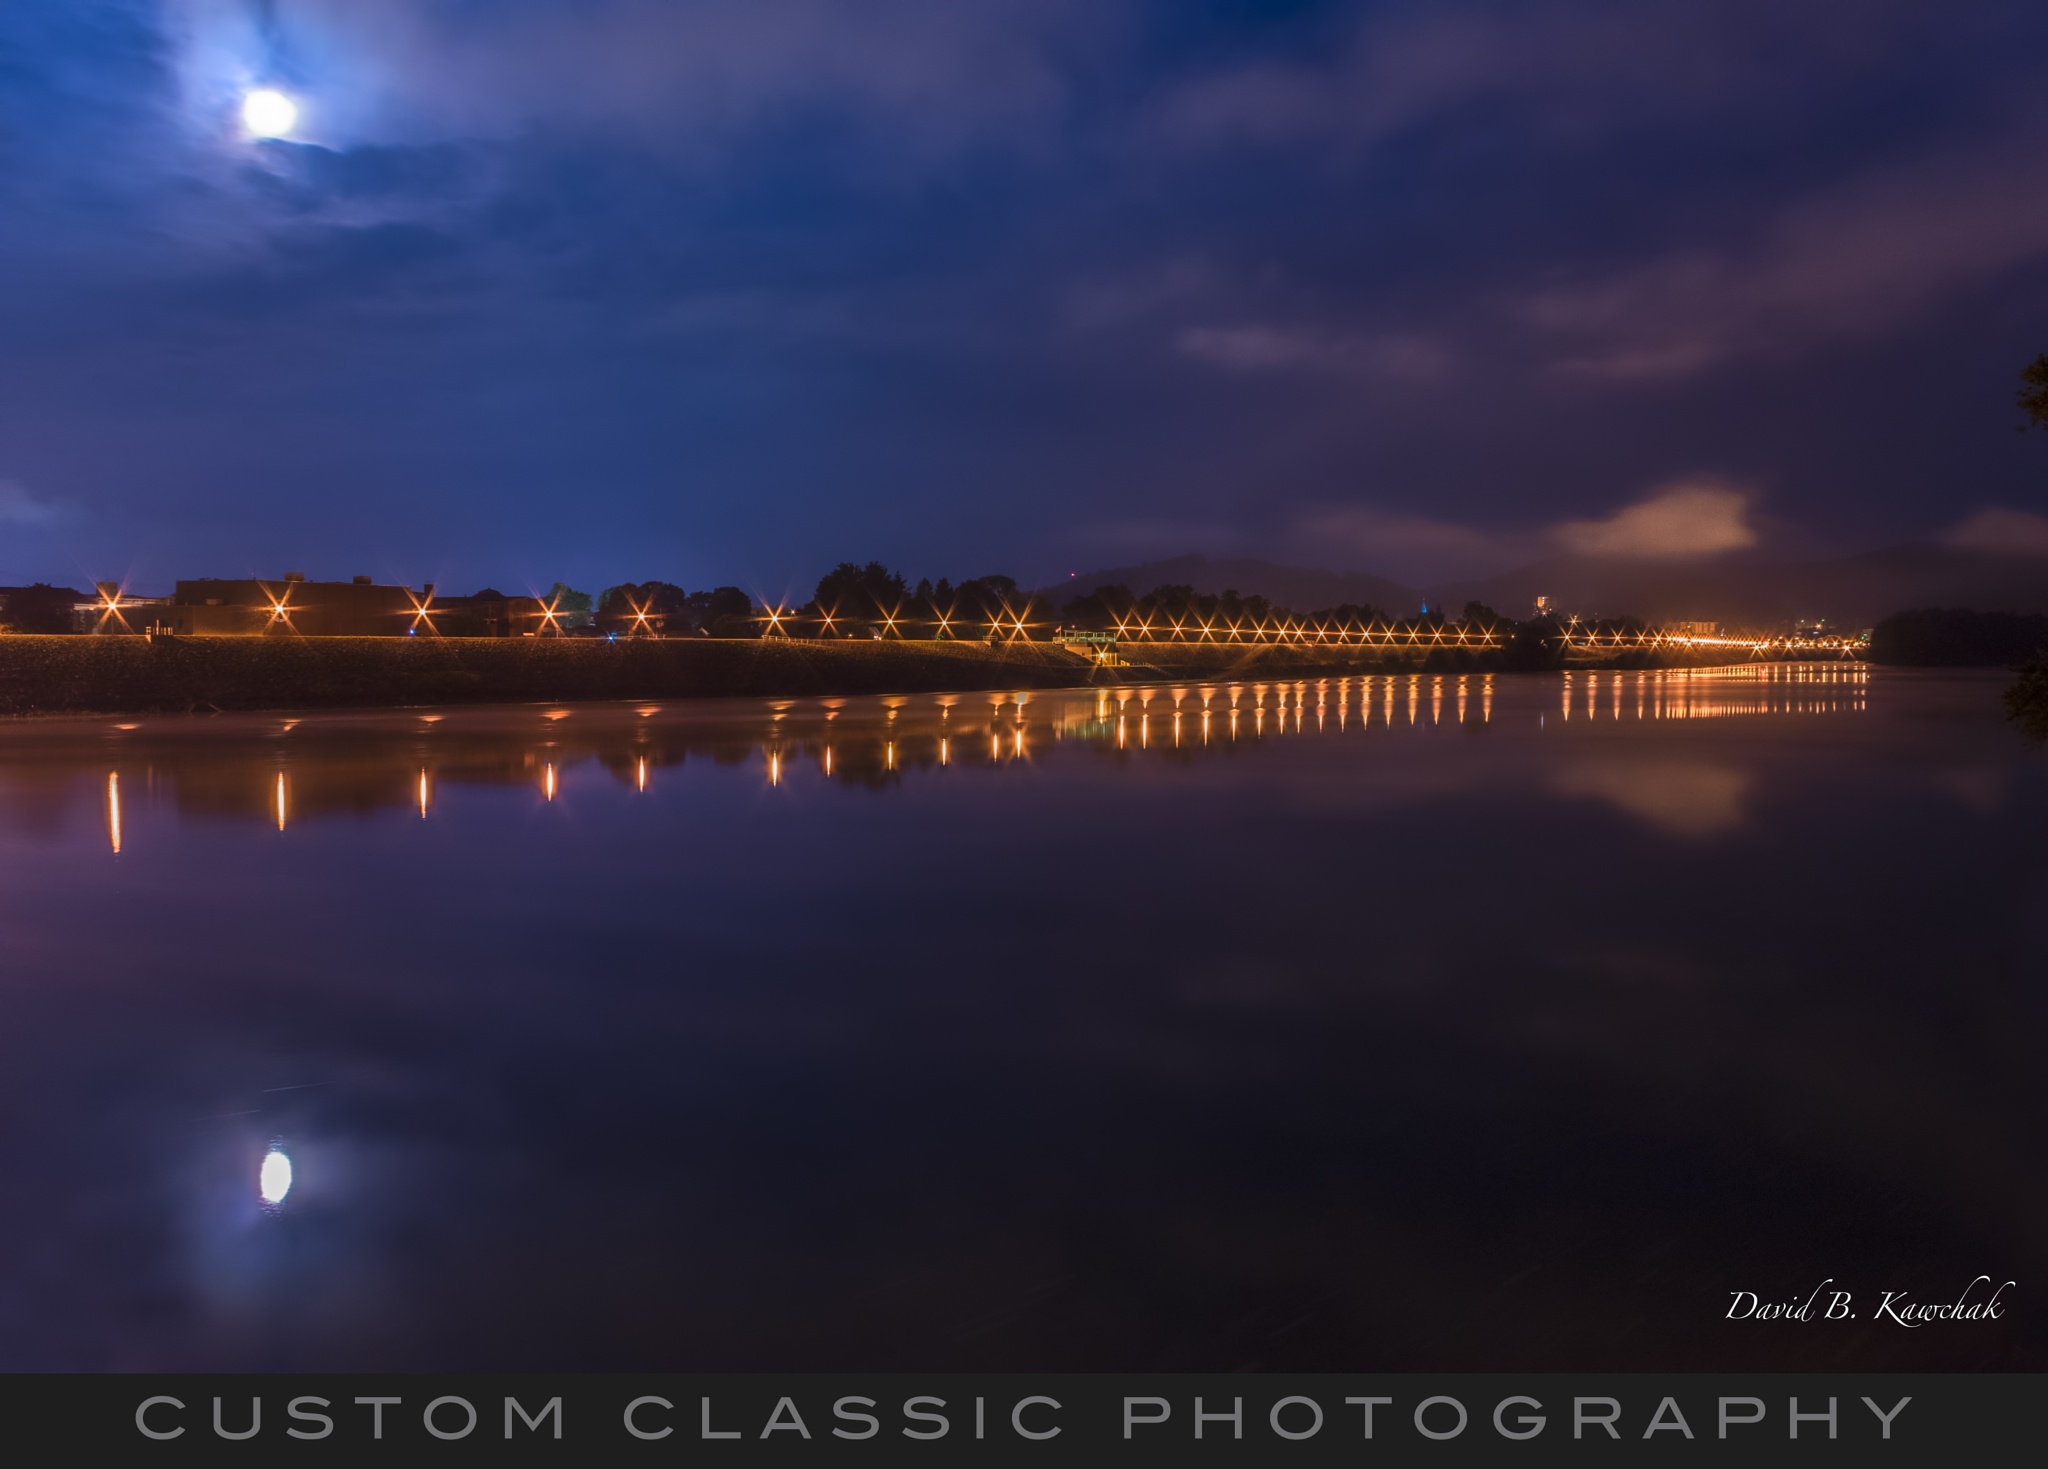 Night along the river by davidbrucekawchak